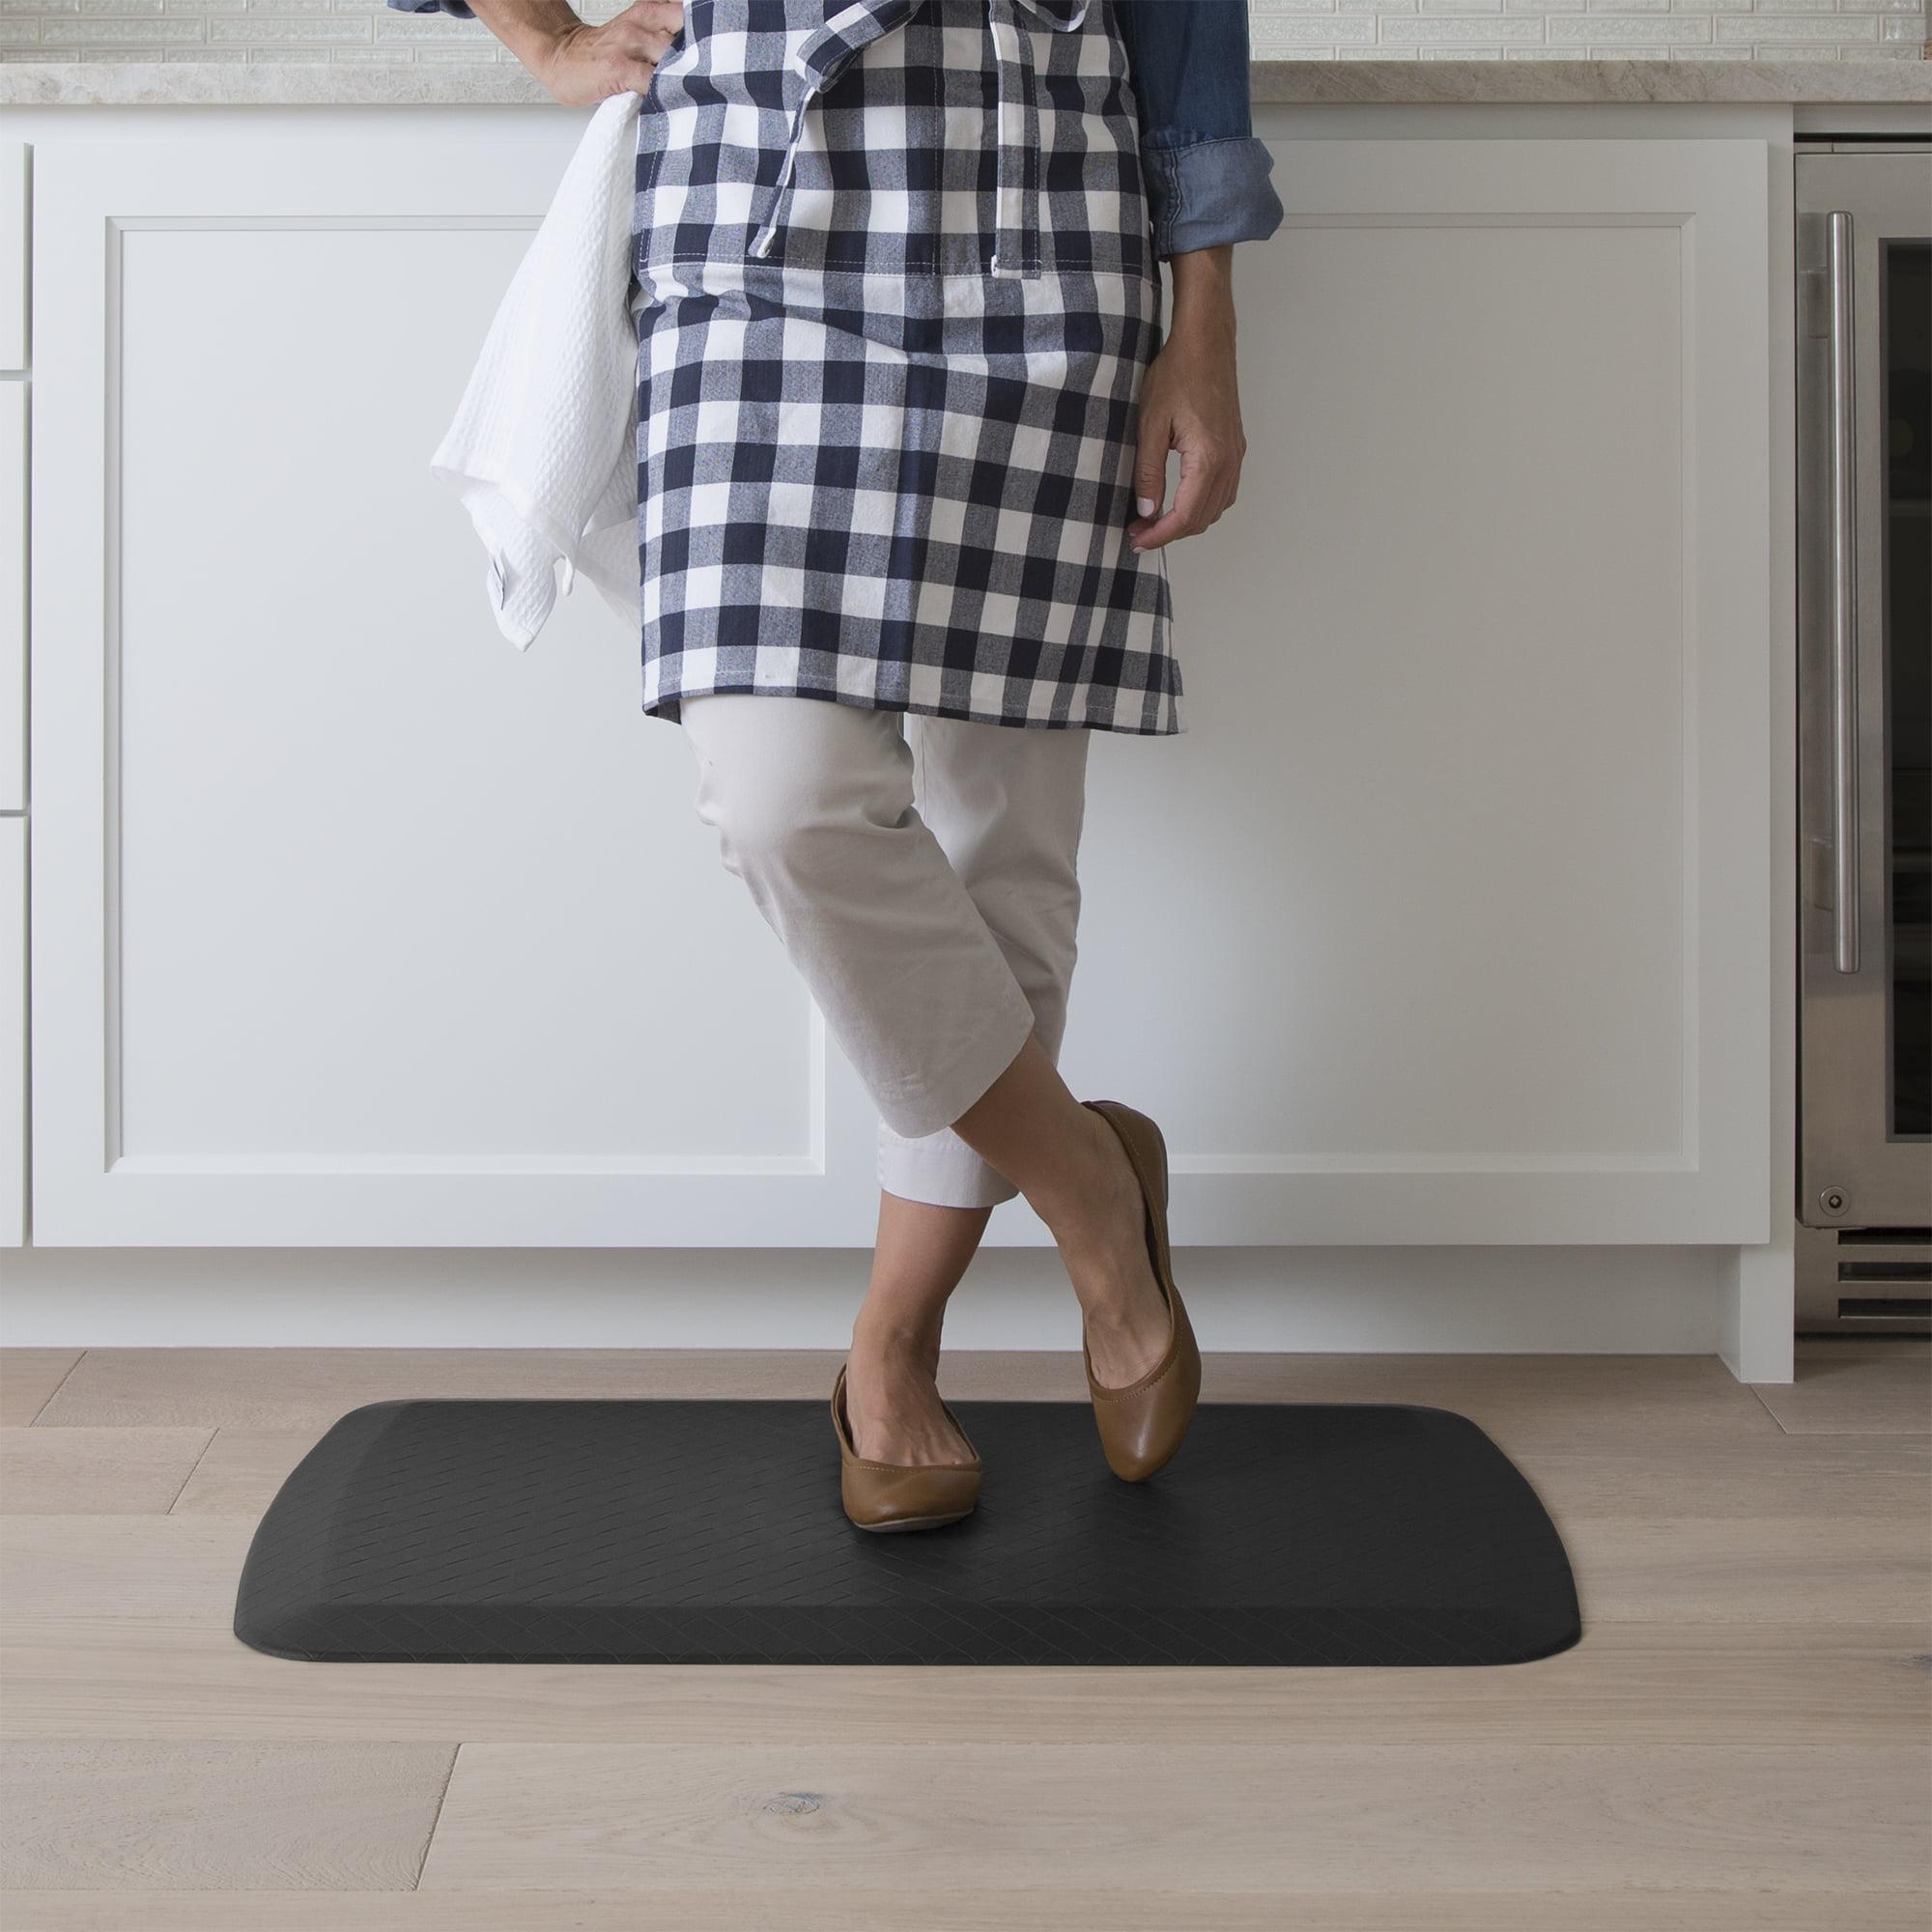 NEW! GelPro Basics Kitchen Comfort Relief Mat 20x32 Basketweave Black